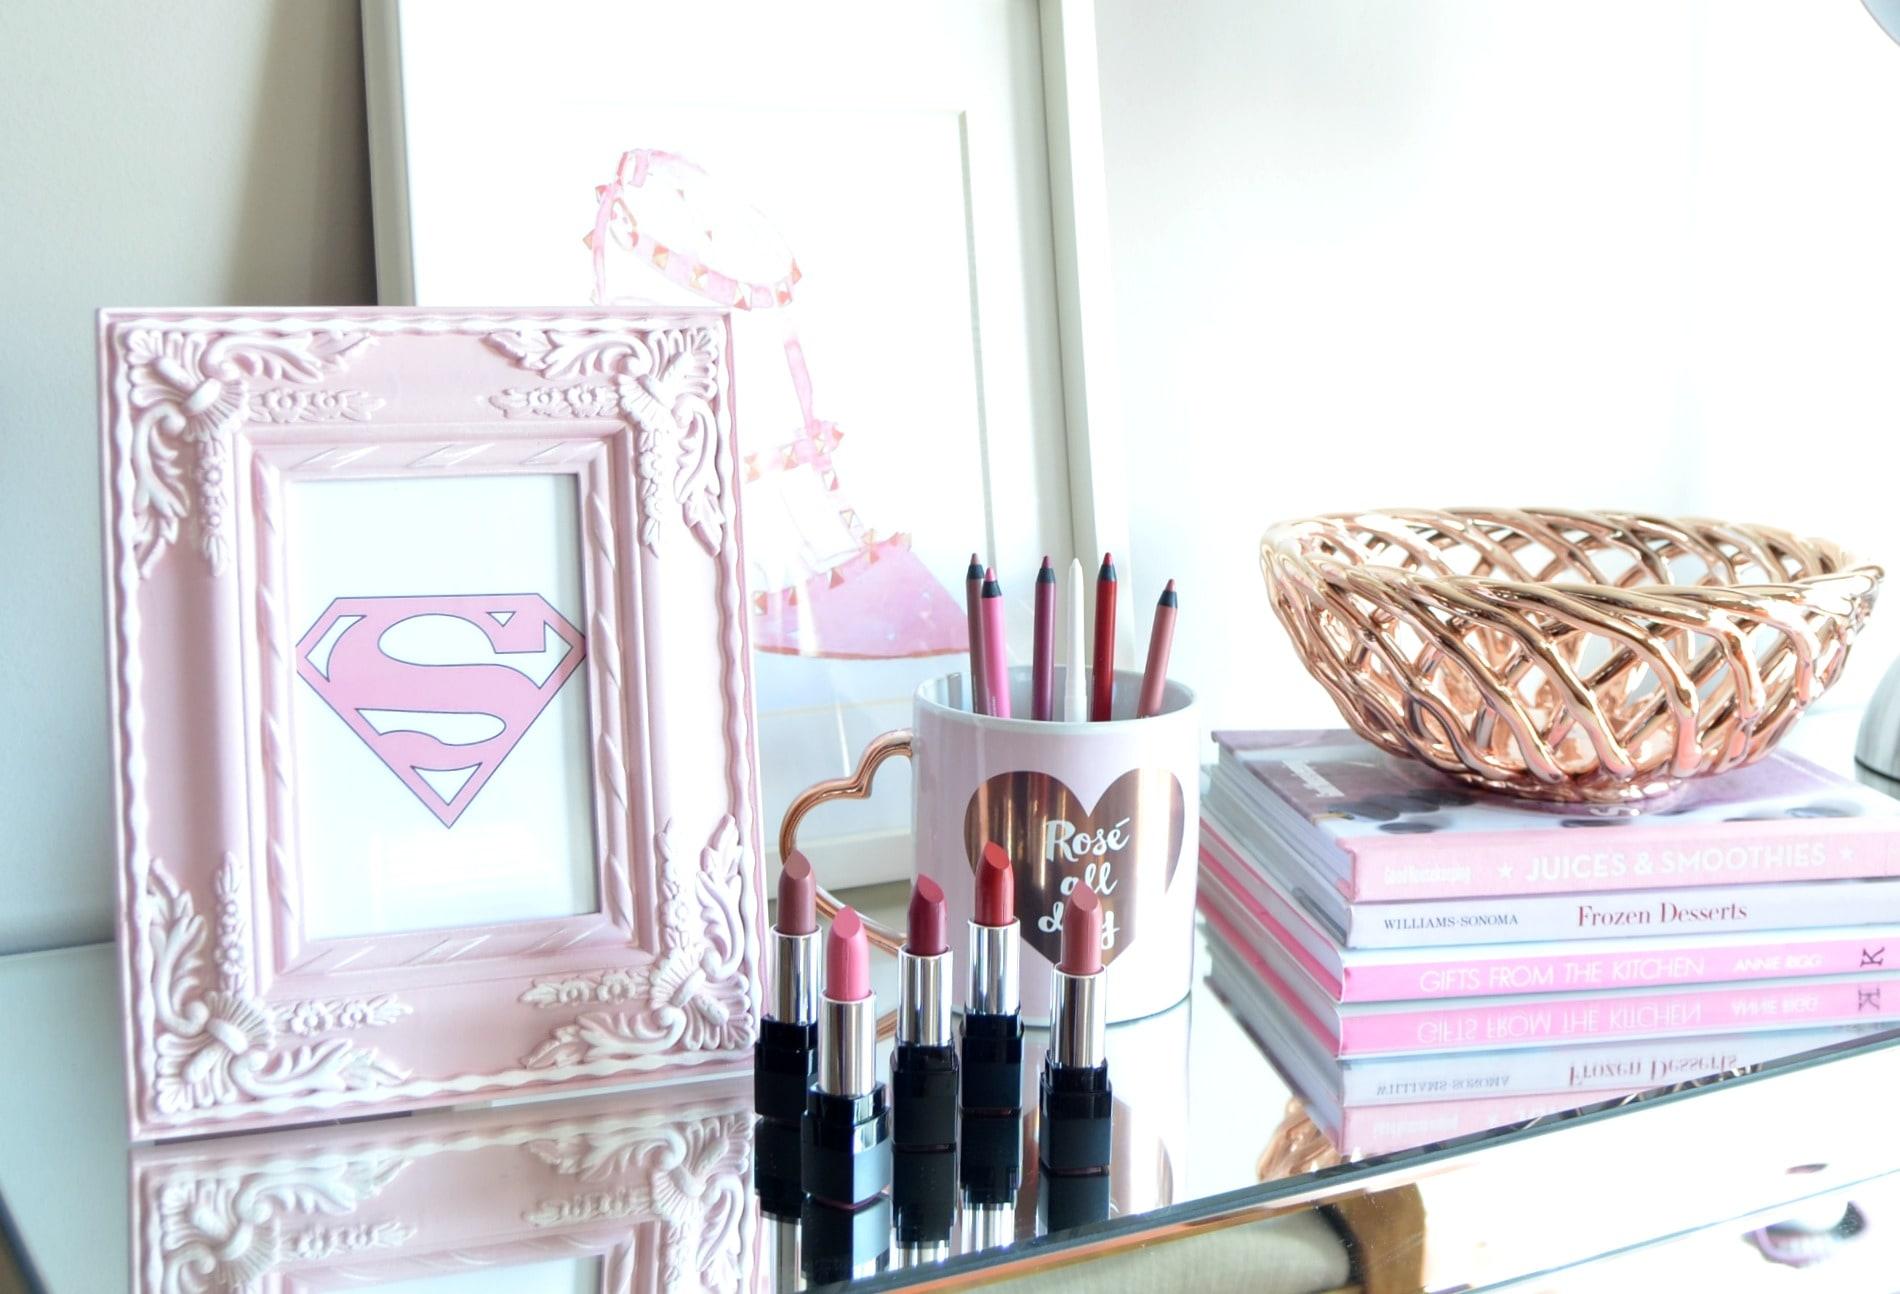 Marcelle Rouge Xpression Velvet Gel Lipstick